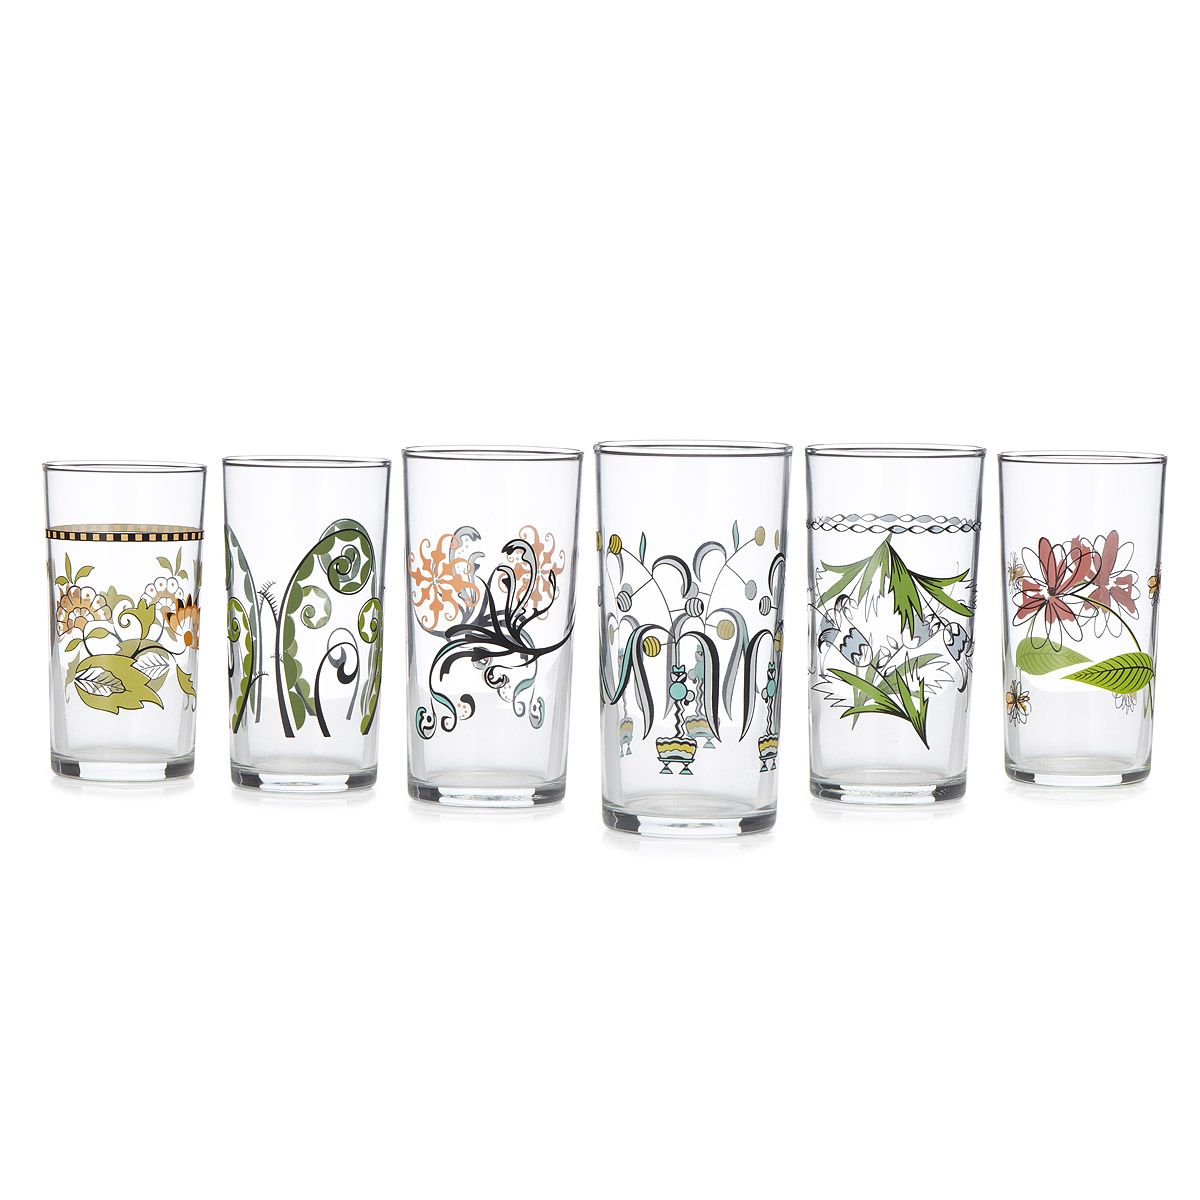 FLORAL WINE GLASSES - SET OF 6 | Italian glassware | UncommonGoods